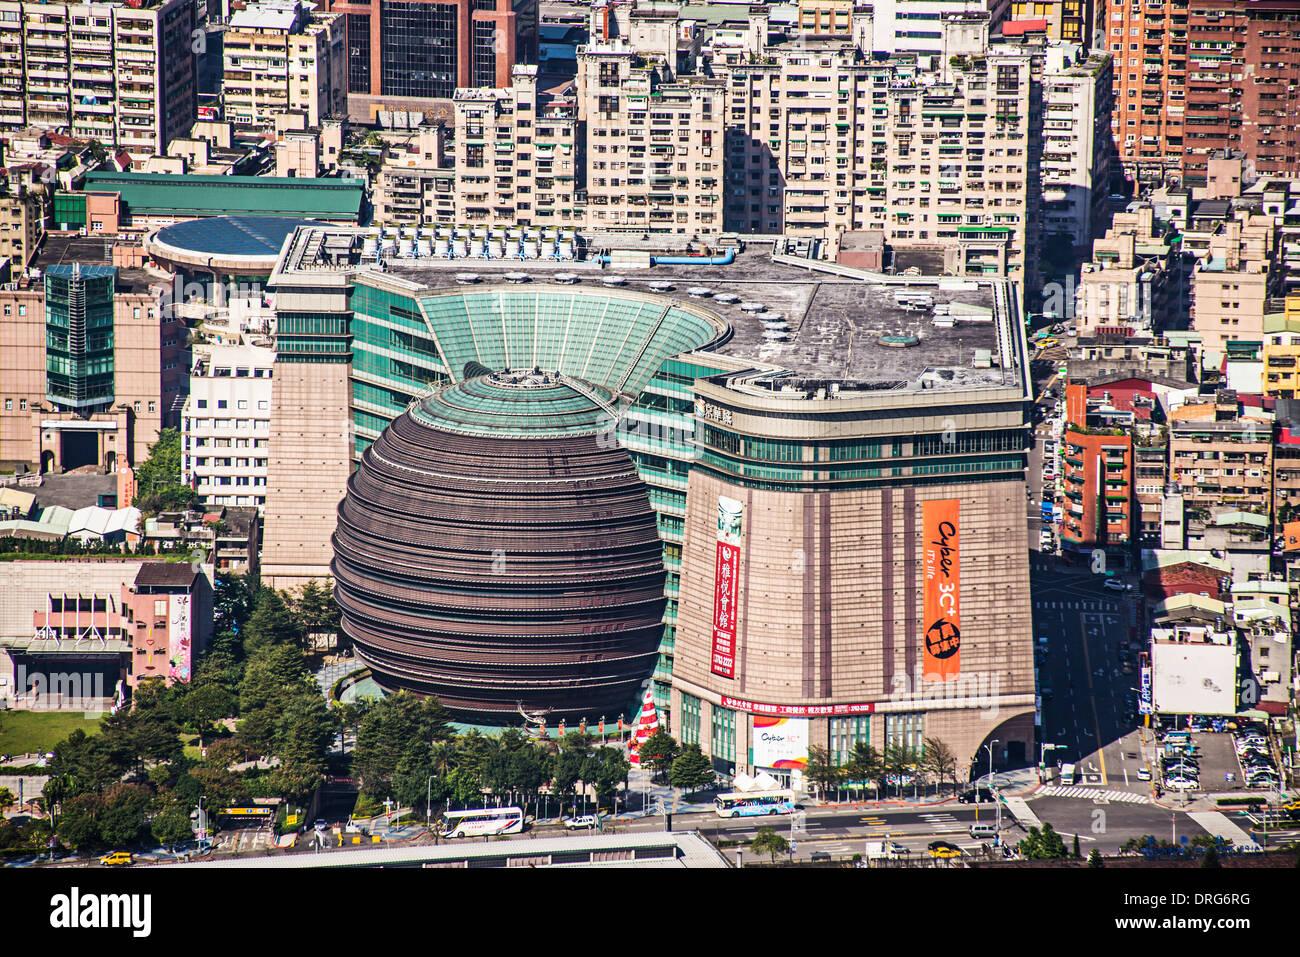 Core Pacific City in Taipei, Taiwan. - Stock Image